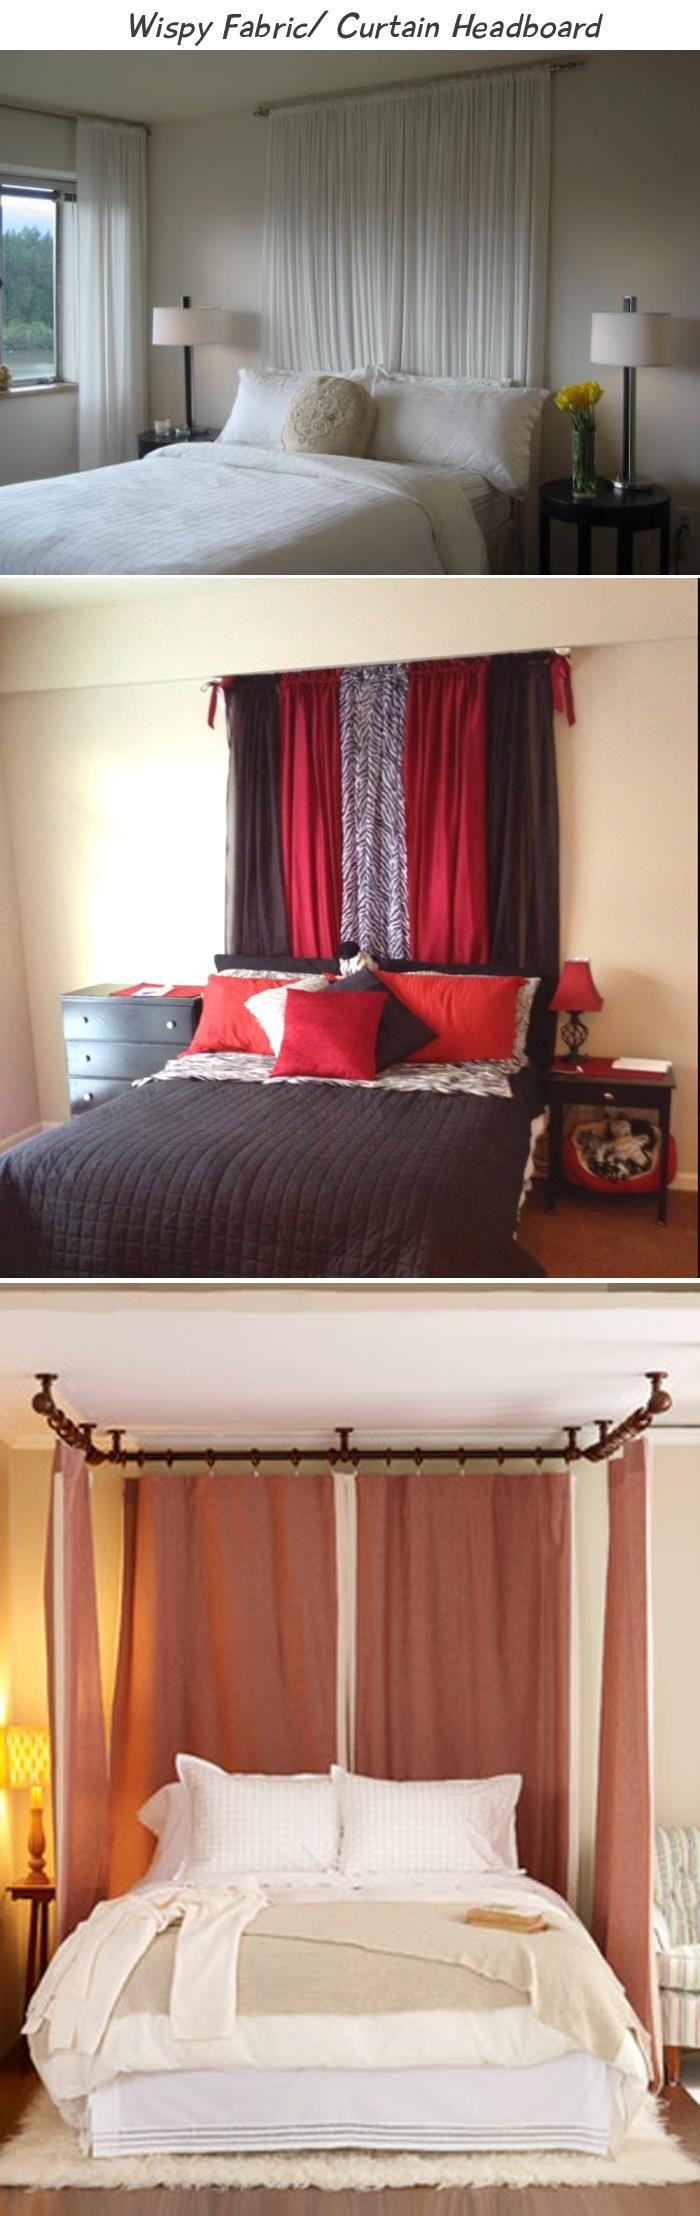 Whispy Fabric or curtain headboard